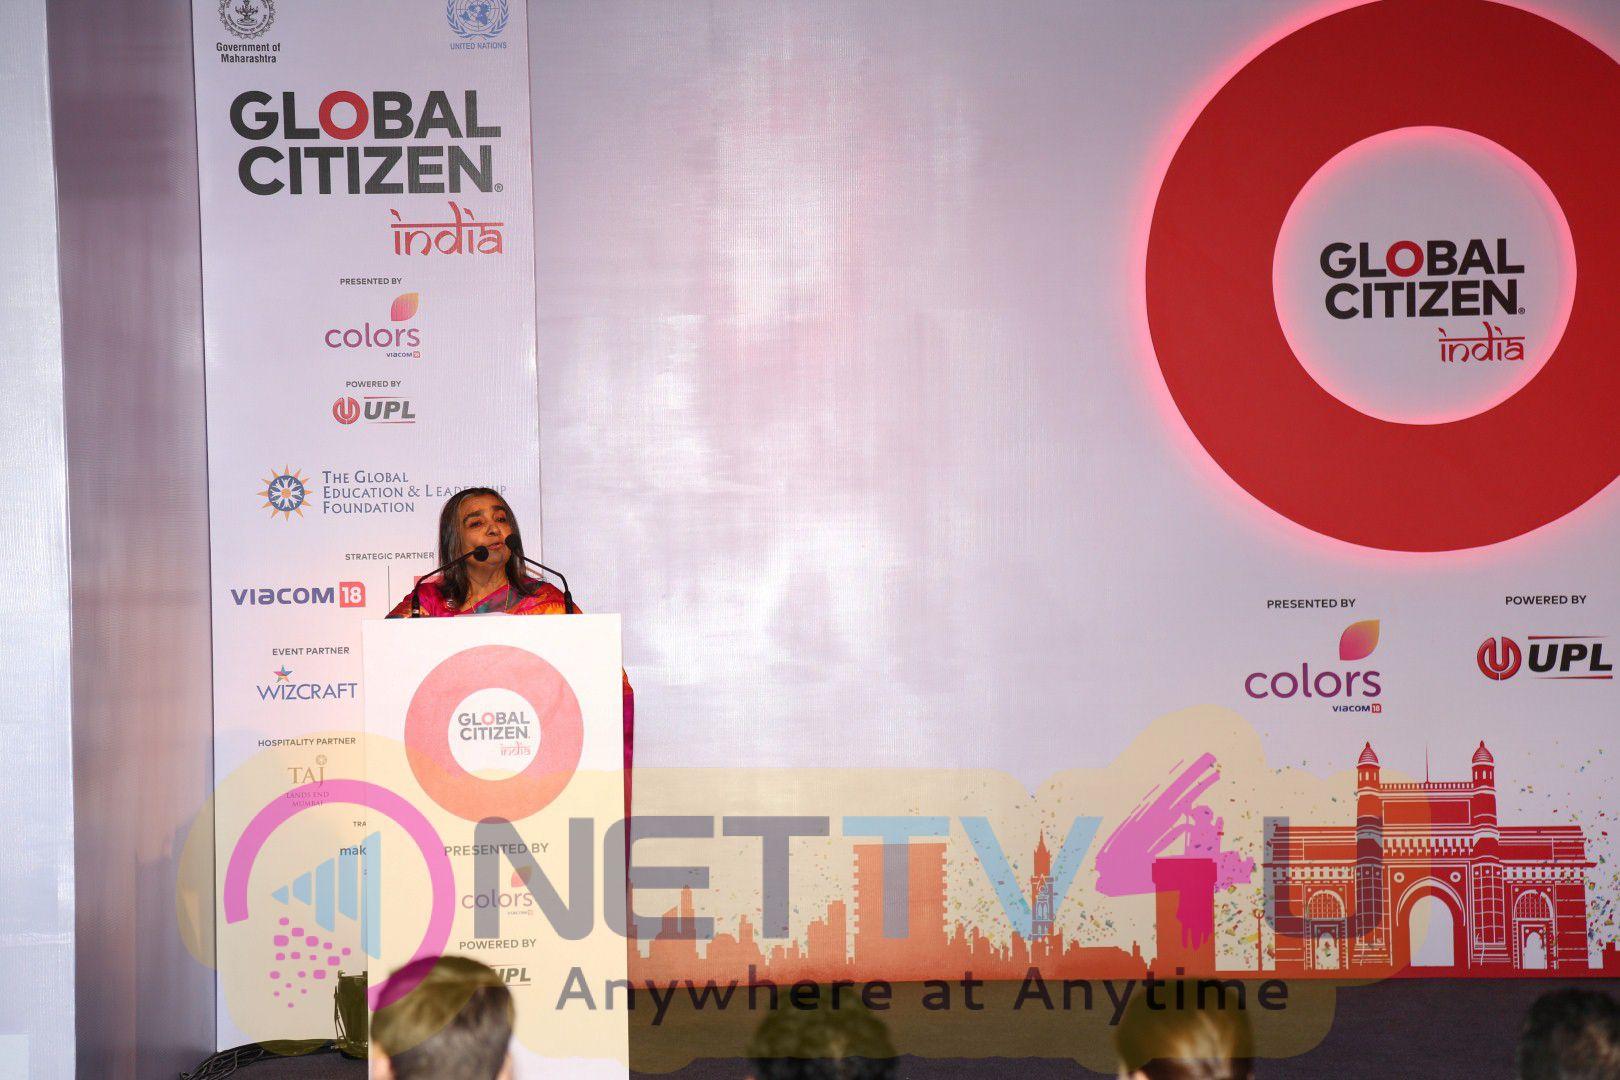 Launch Of Global Citizen India In The Presence Of Big B,Aamir Khan,Farhan Akhtar,Kareena Kapoor & A.R. Rahman Photos